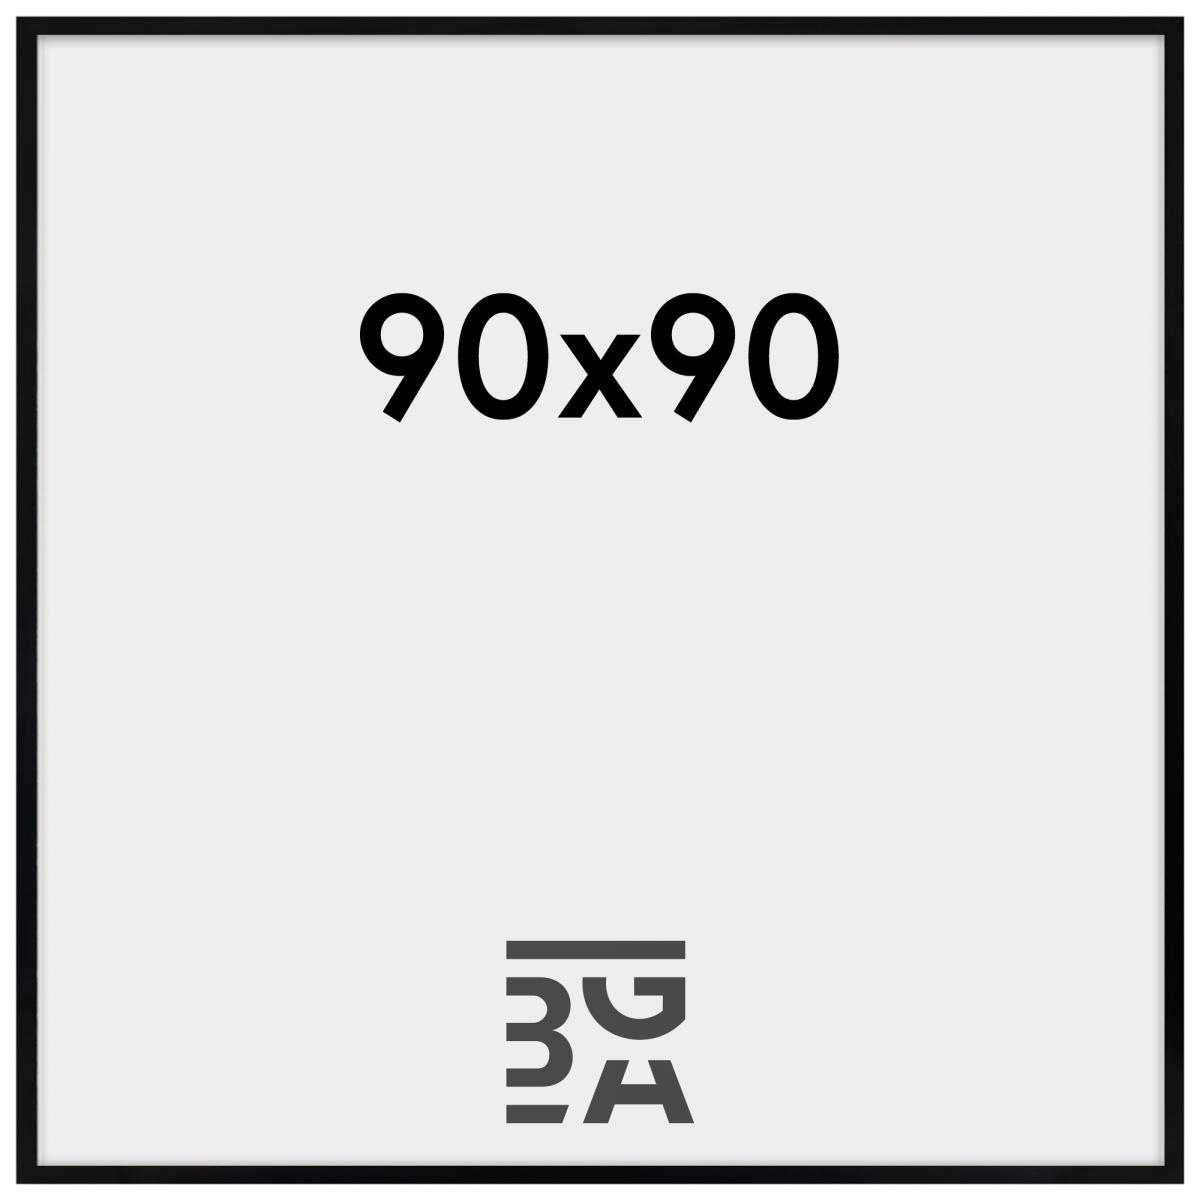 Kjempebra Amanda Box Plexiglas ramme Sort 90x90 cm - BGA Nordic GA-08